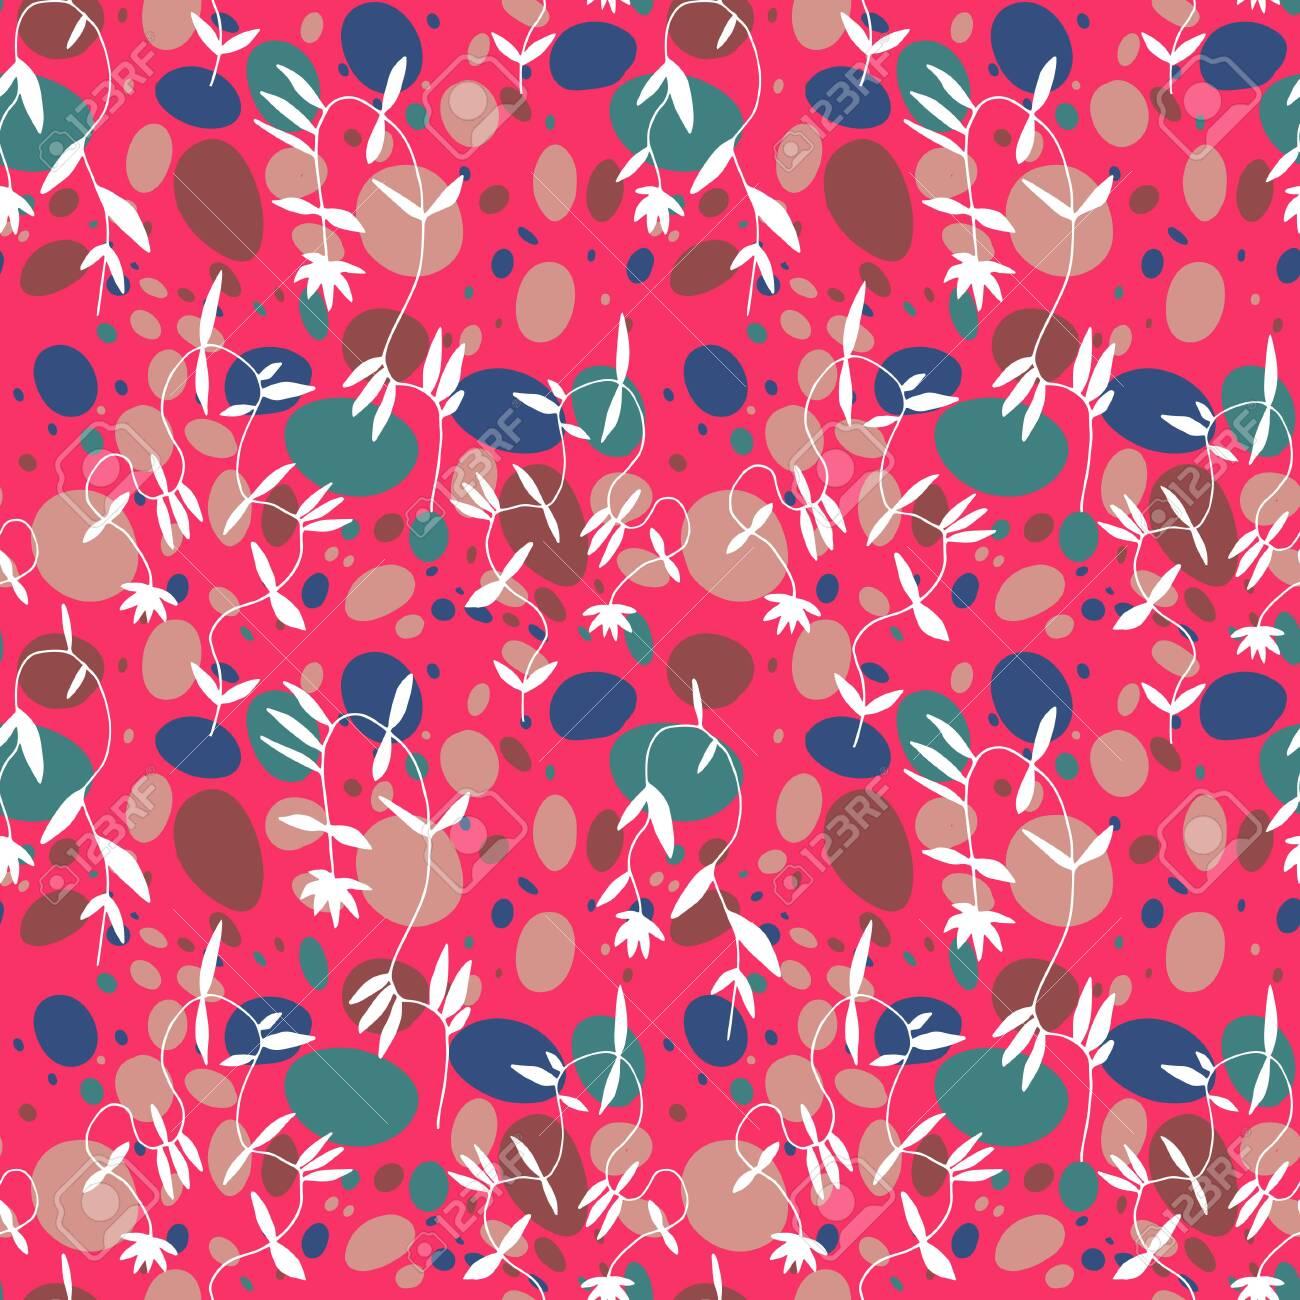 Little flower seamless pattern in vintage Scandinavian minimalism aesthetic, retro background. - 148404816